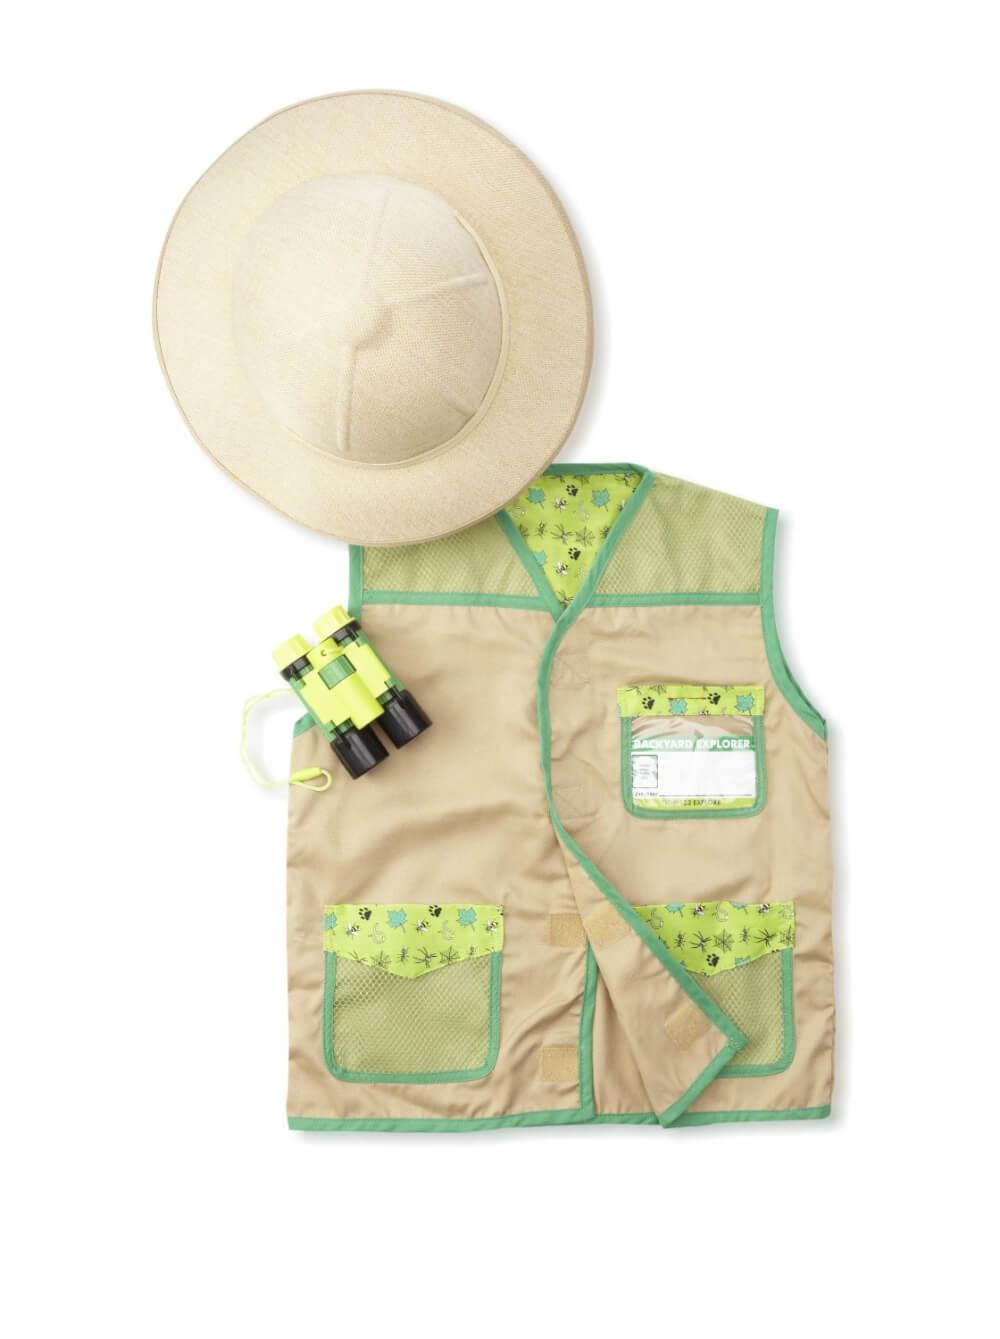 Doug Backyard Explorer Costume